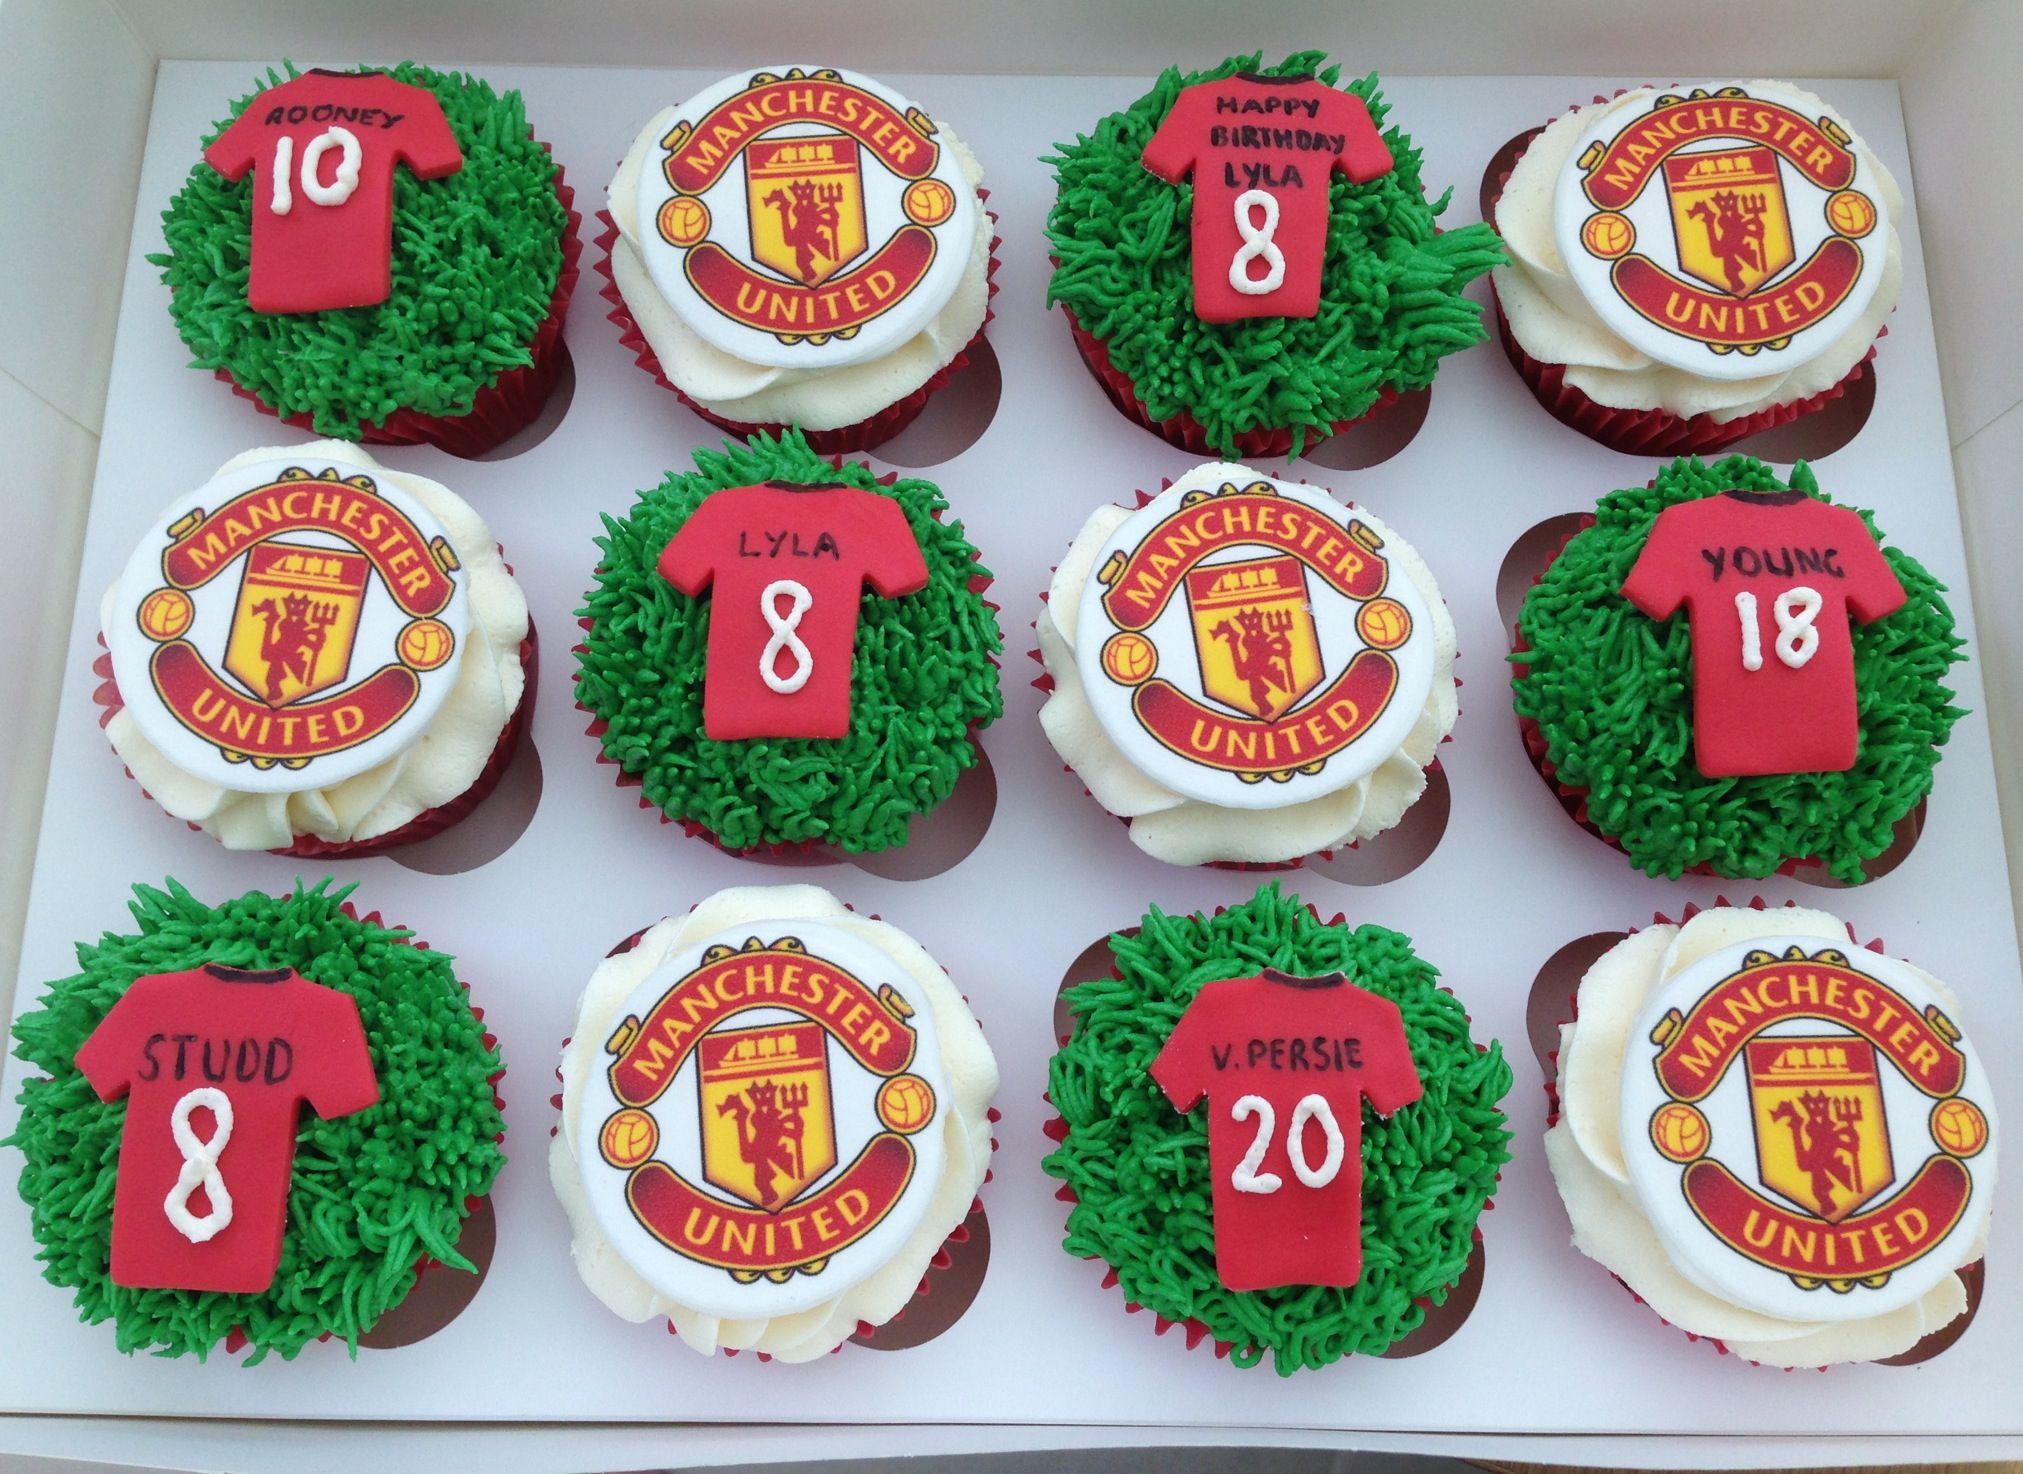 Man United Cakes Cake Design Cupcakes For Men Cake Pop Stands